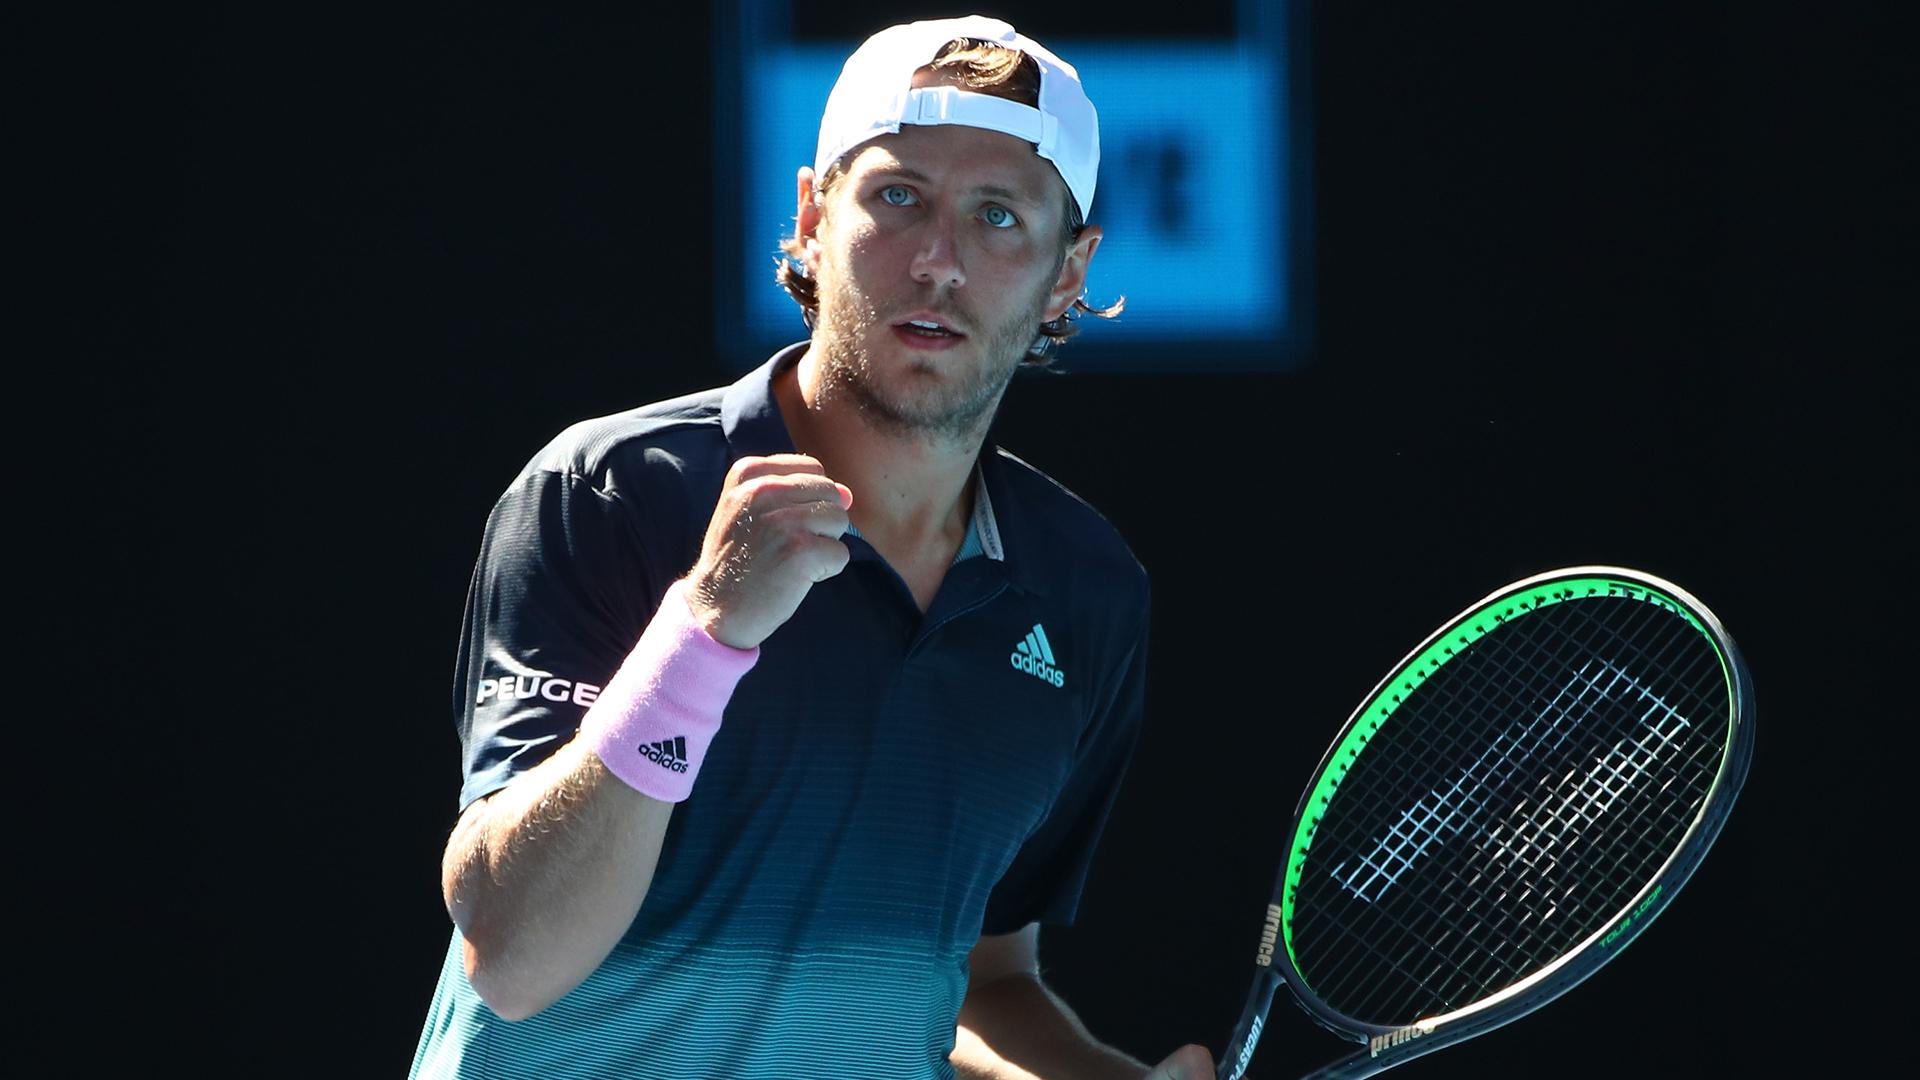 Australian Open 2019: Lucas Pouille upsets Milos Raonic to reach semis